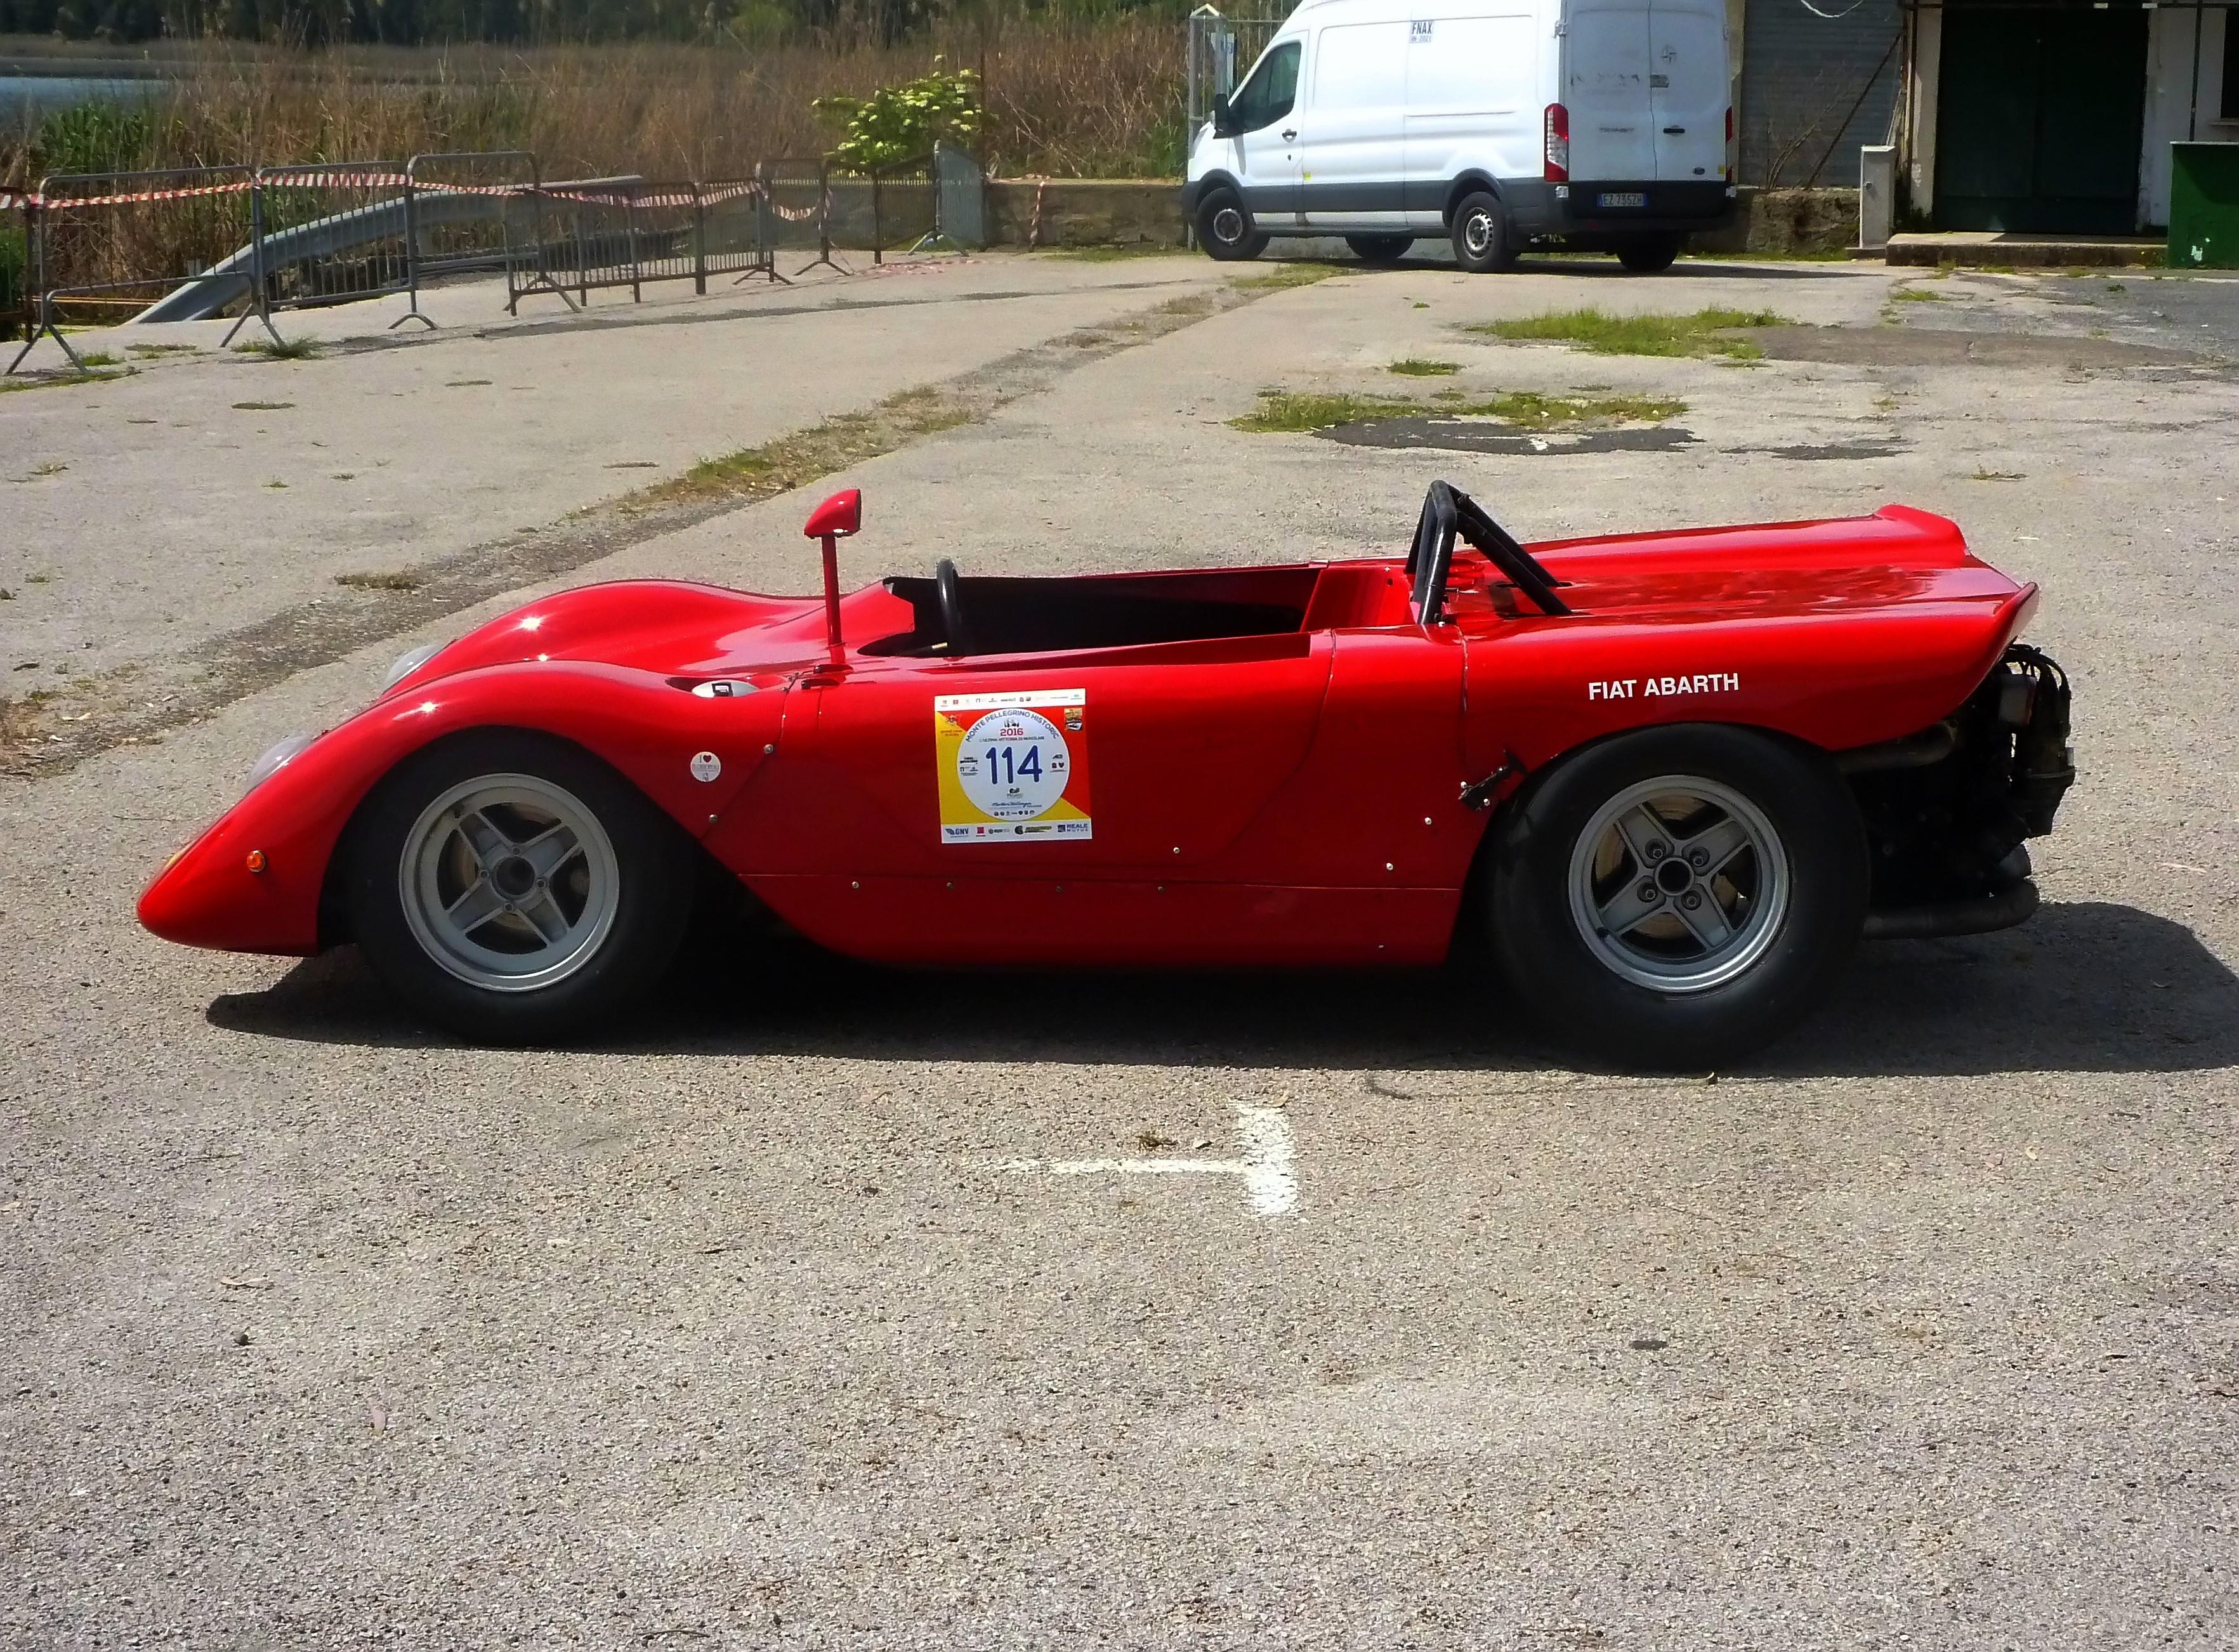 1971 Abarth 1300 SE 018 Biposto Cuneo (17)